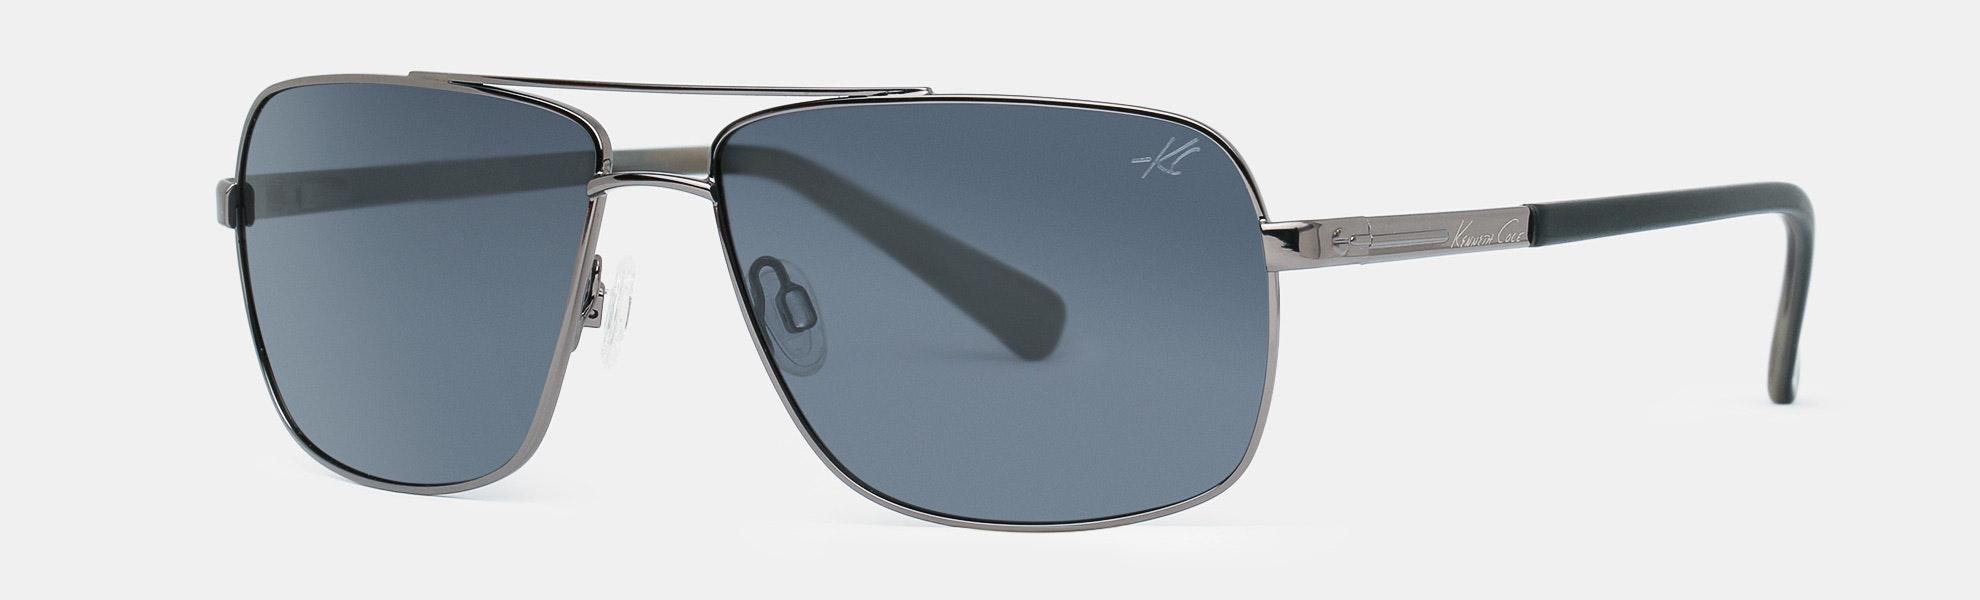 Kenneth Cole New York Polarized Sunglasses